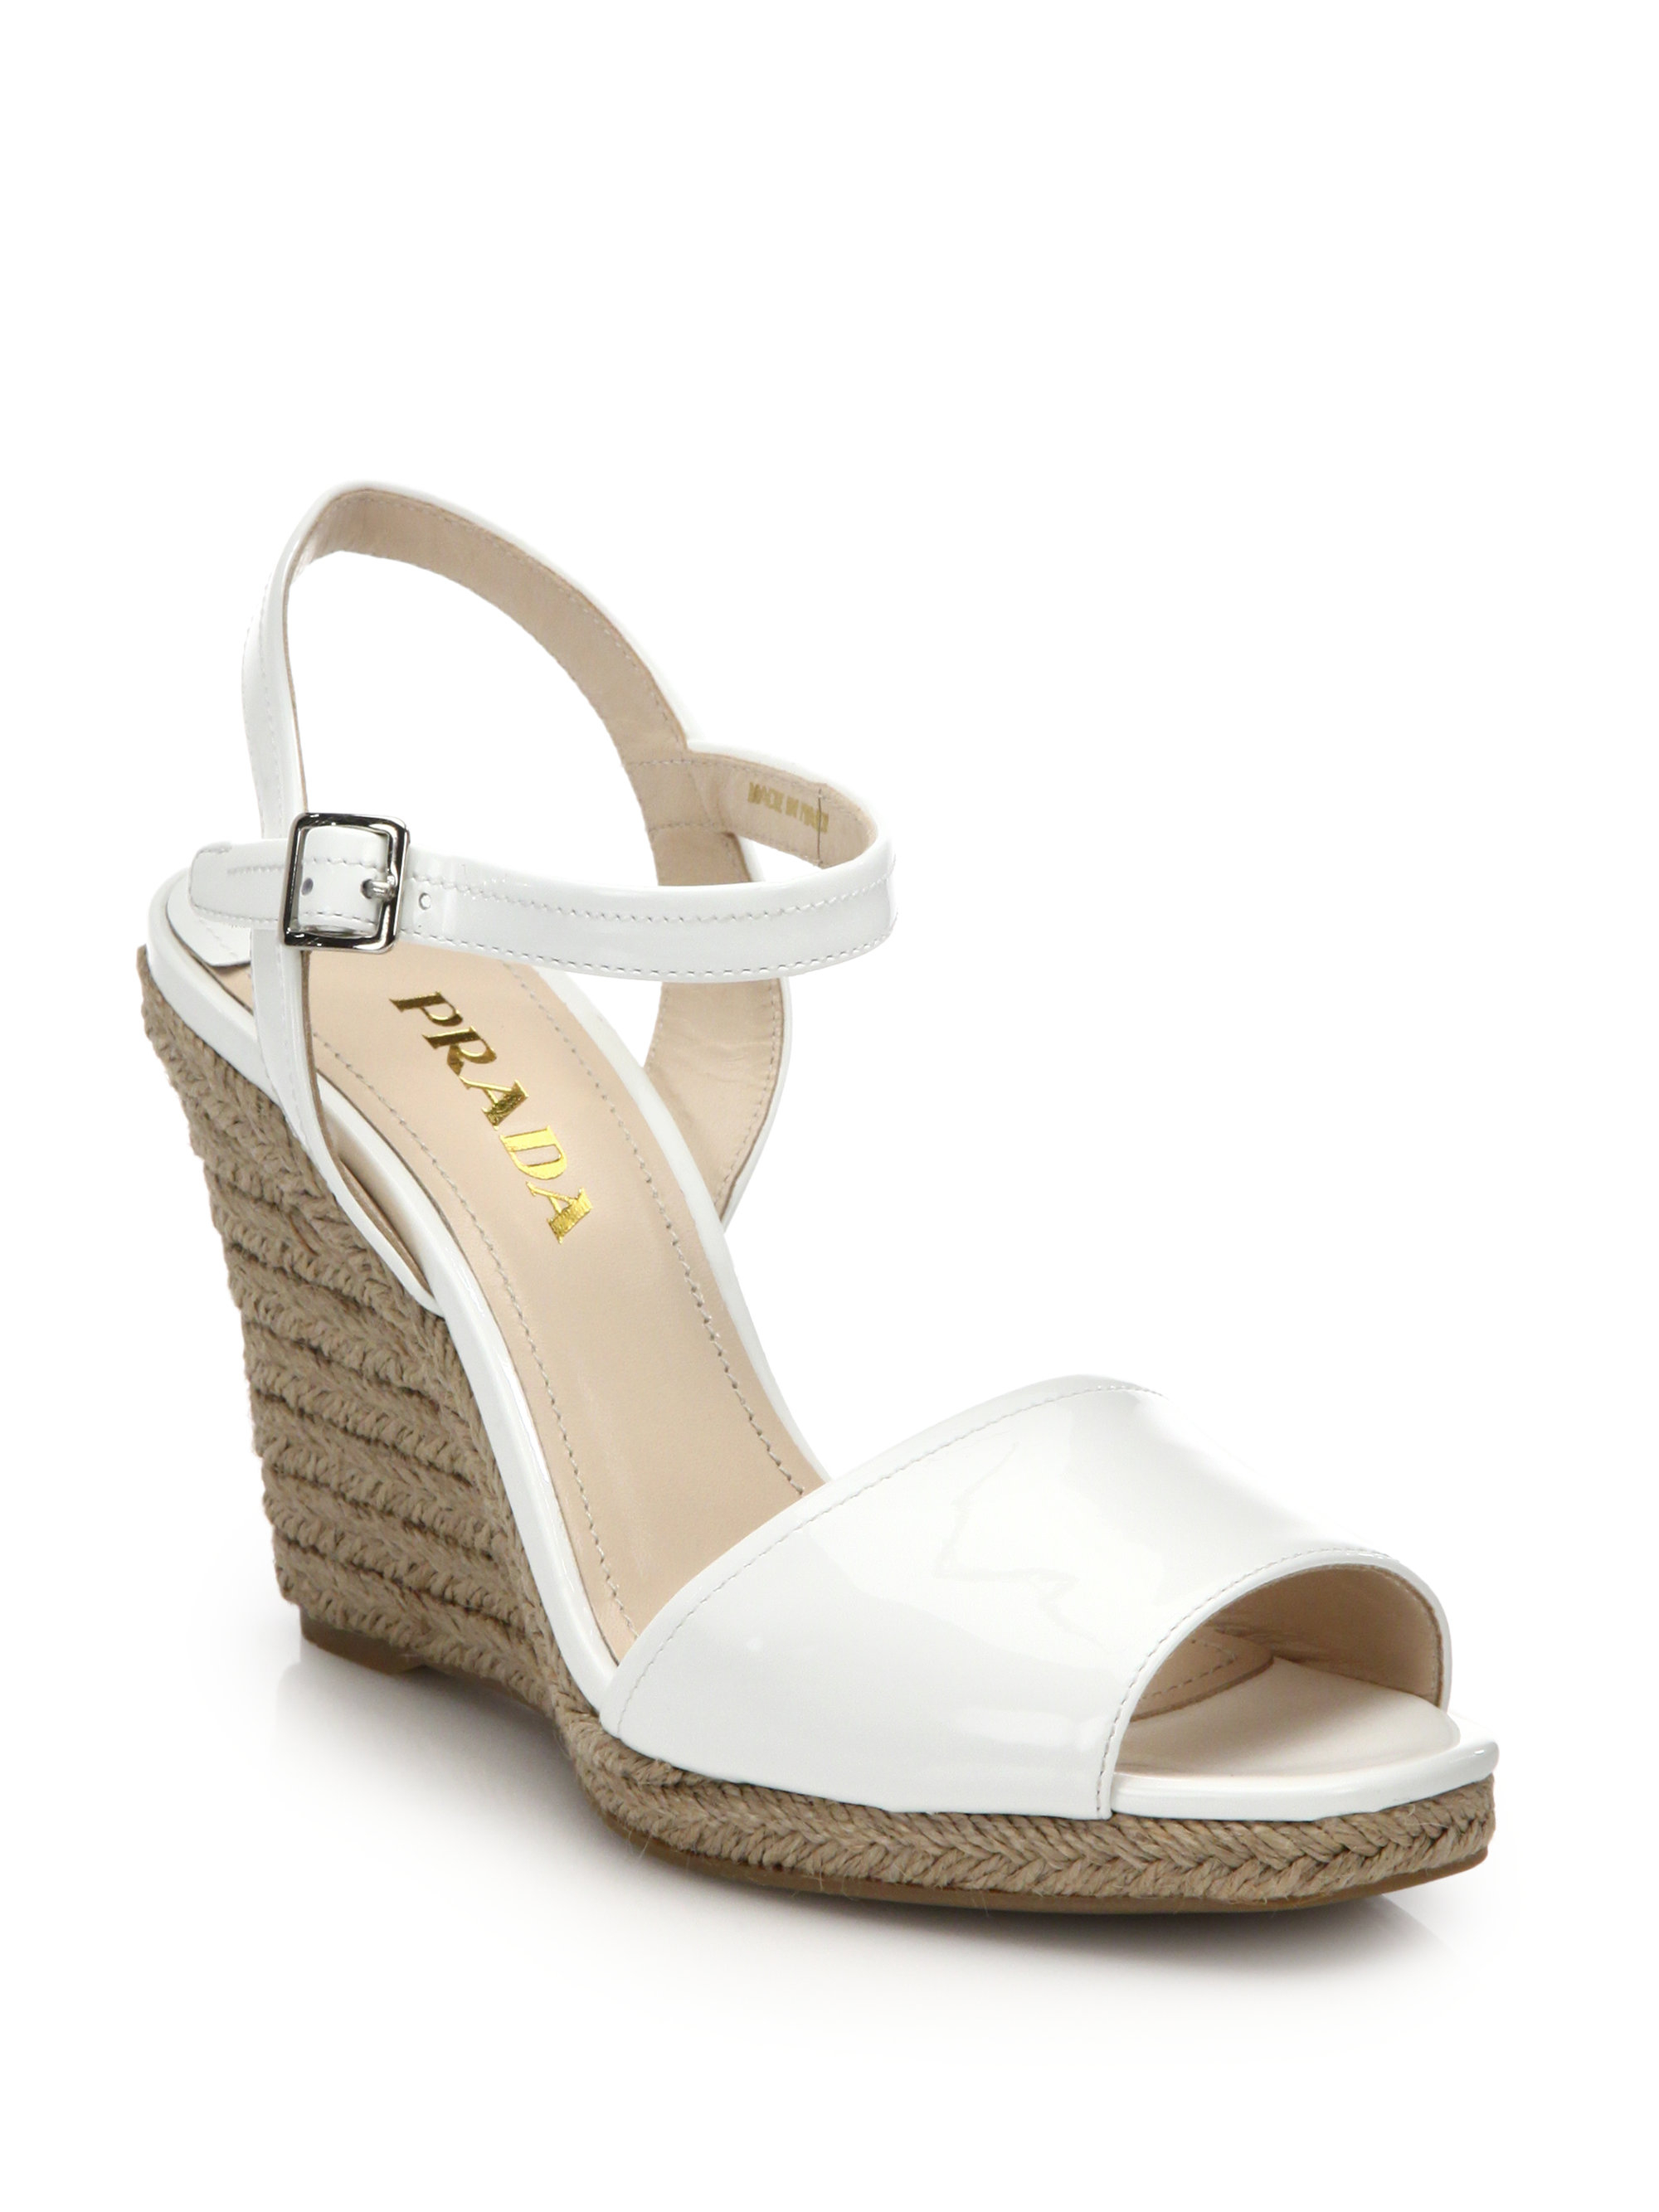 Prada Patent Leather Espadrille Wedge Sandals in White | Lyst